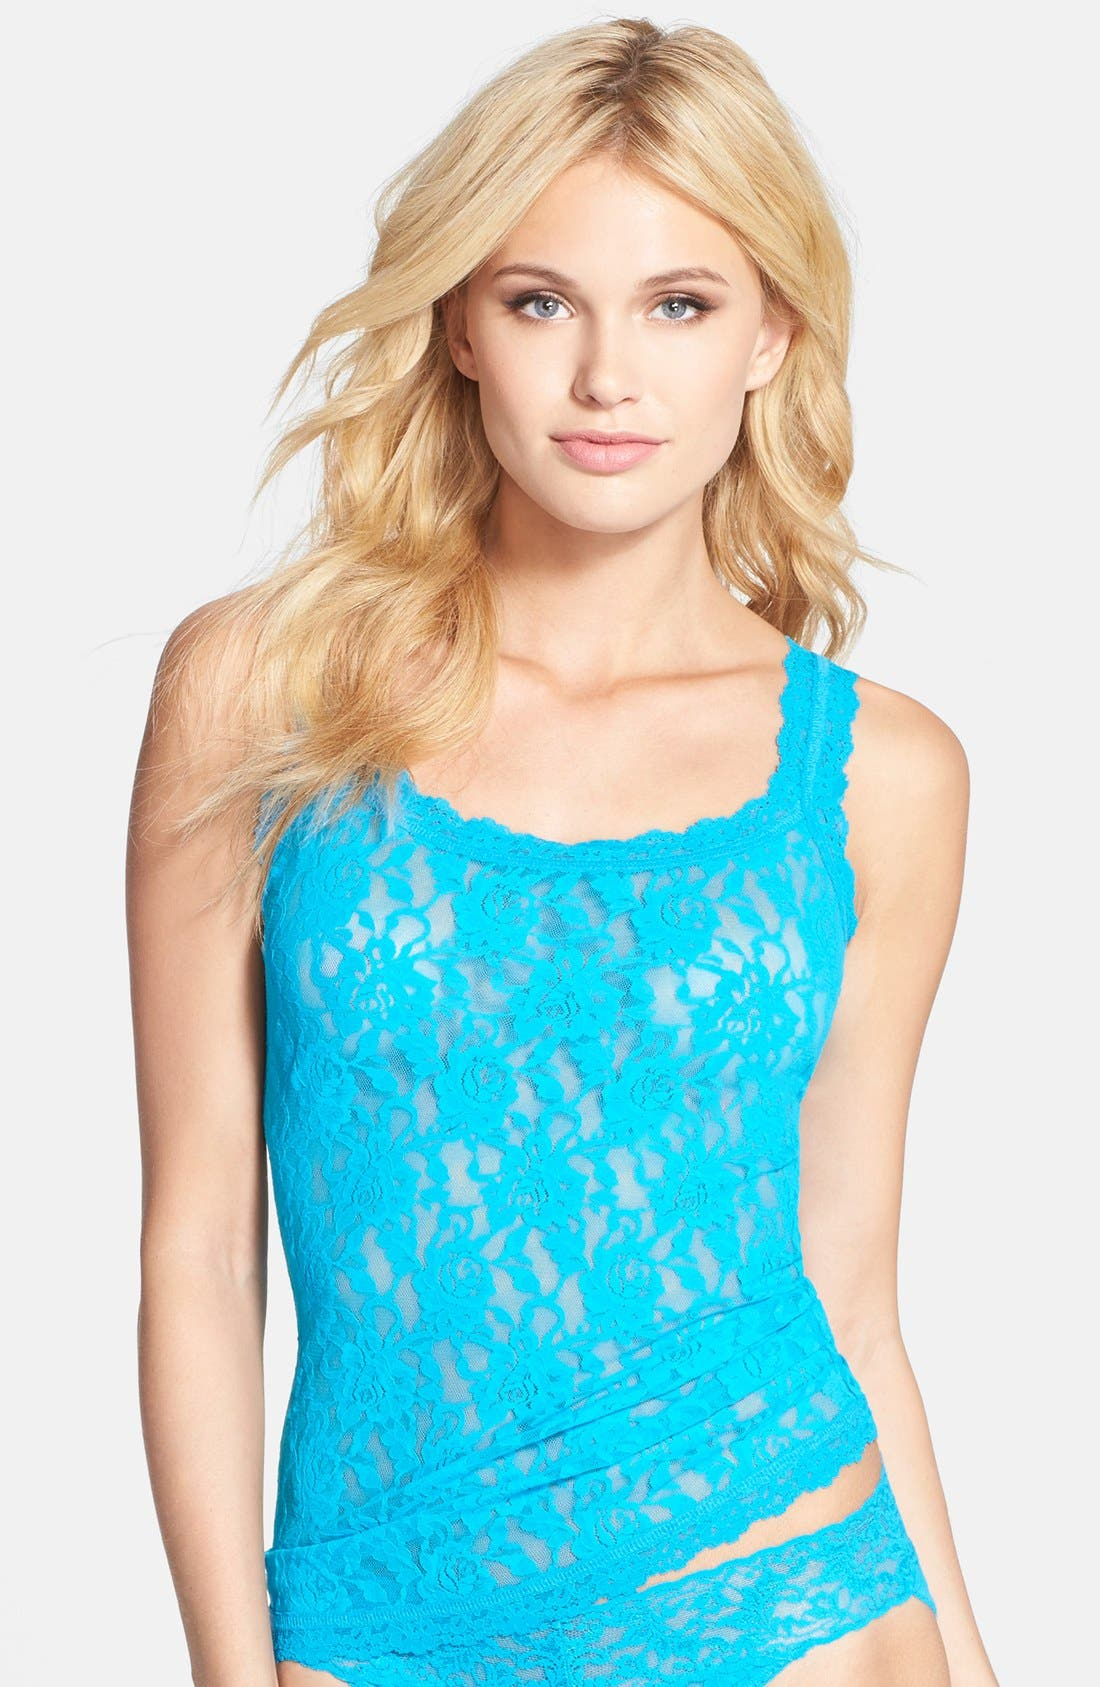 Main Image - Hanky Panky 'Signature Lace' Camisole